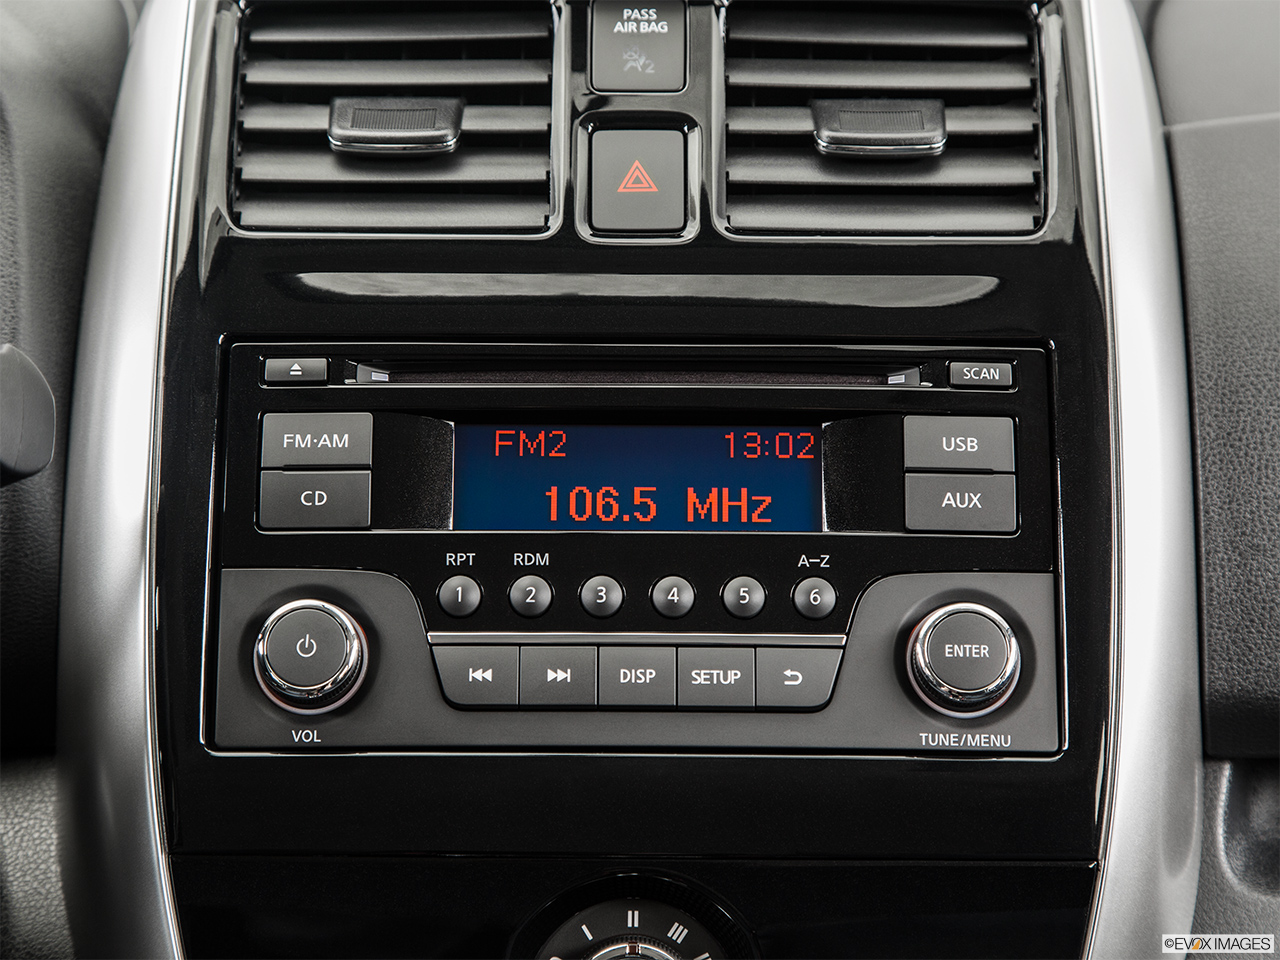 2015 Nissan Versa Note 5 Door CVT 1.6 SV Hatchback ...